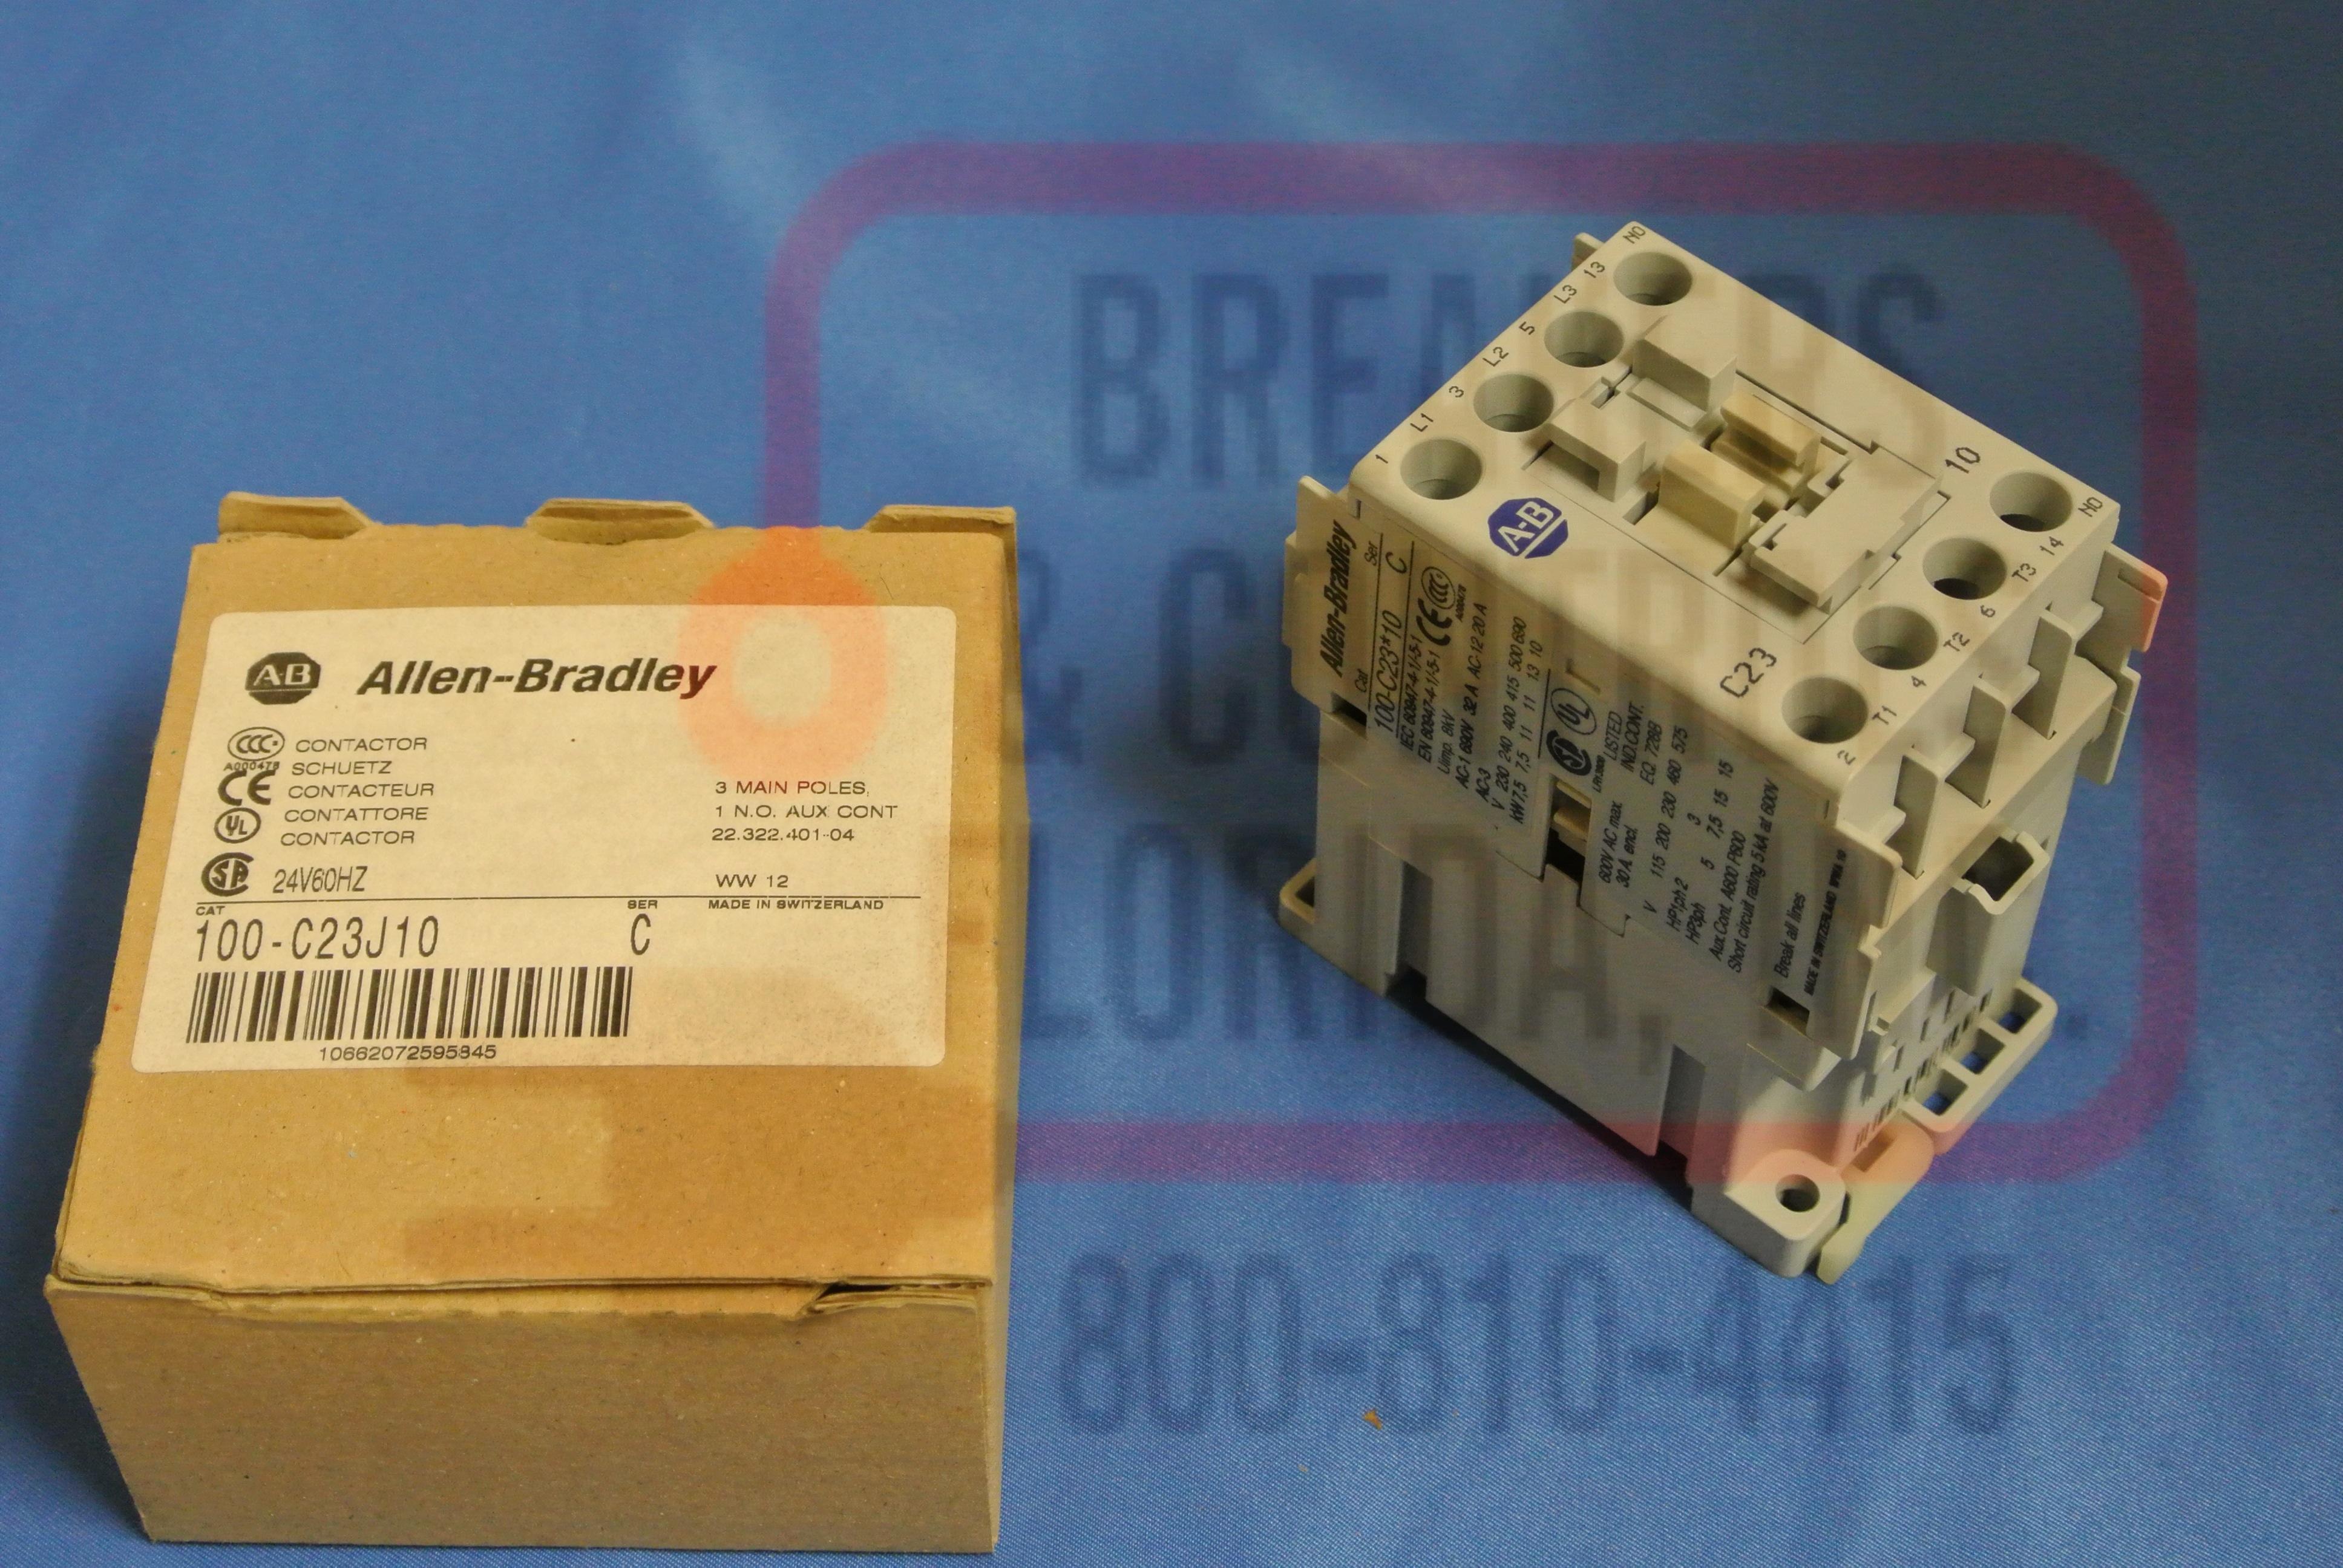 Allen Bradley - 100-C23J10